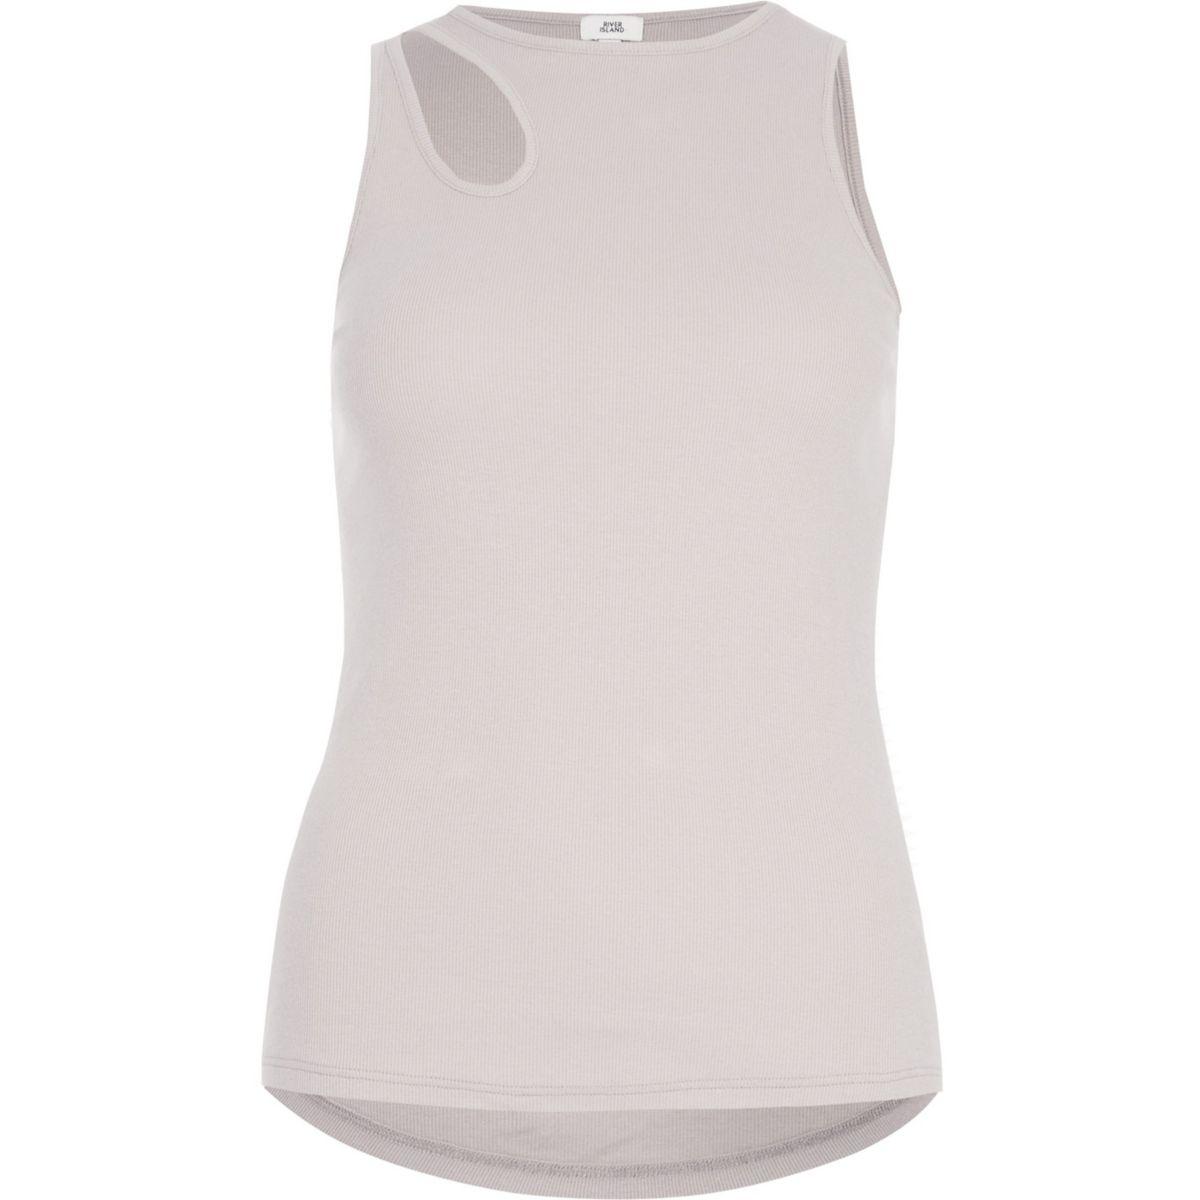 Beige sleeveless cut out tank top